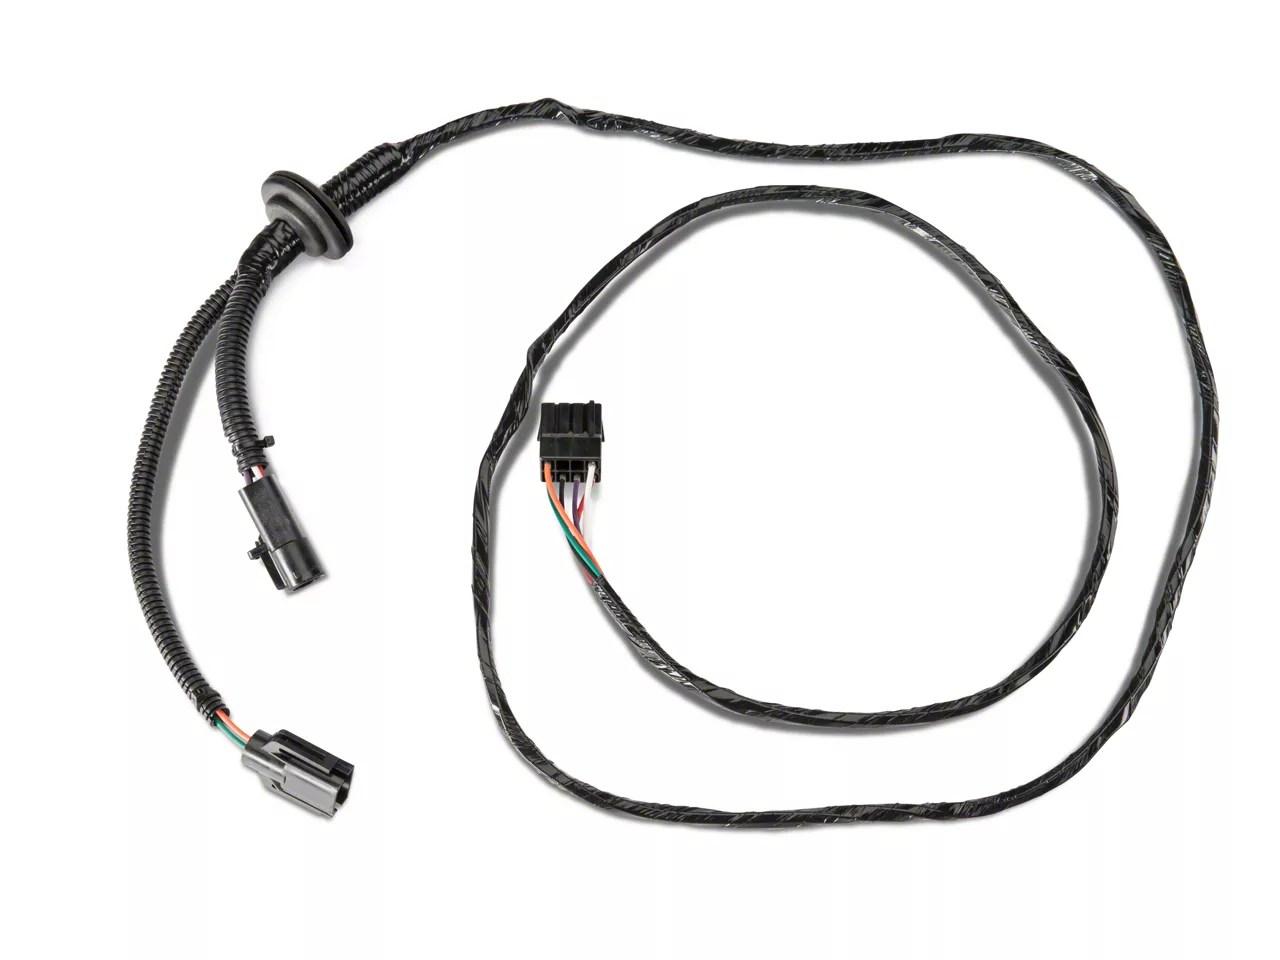 OPR Mustang Transmission Wiring Harness 525012 (87-93 5.0L